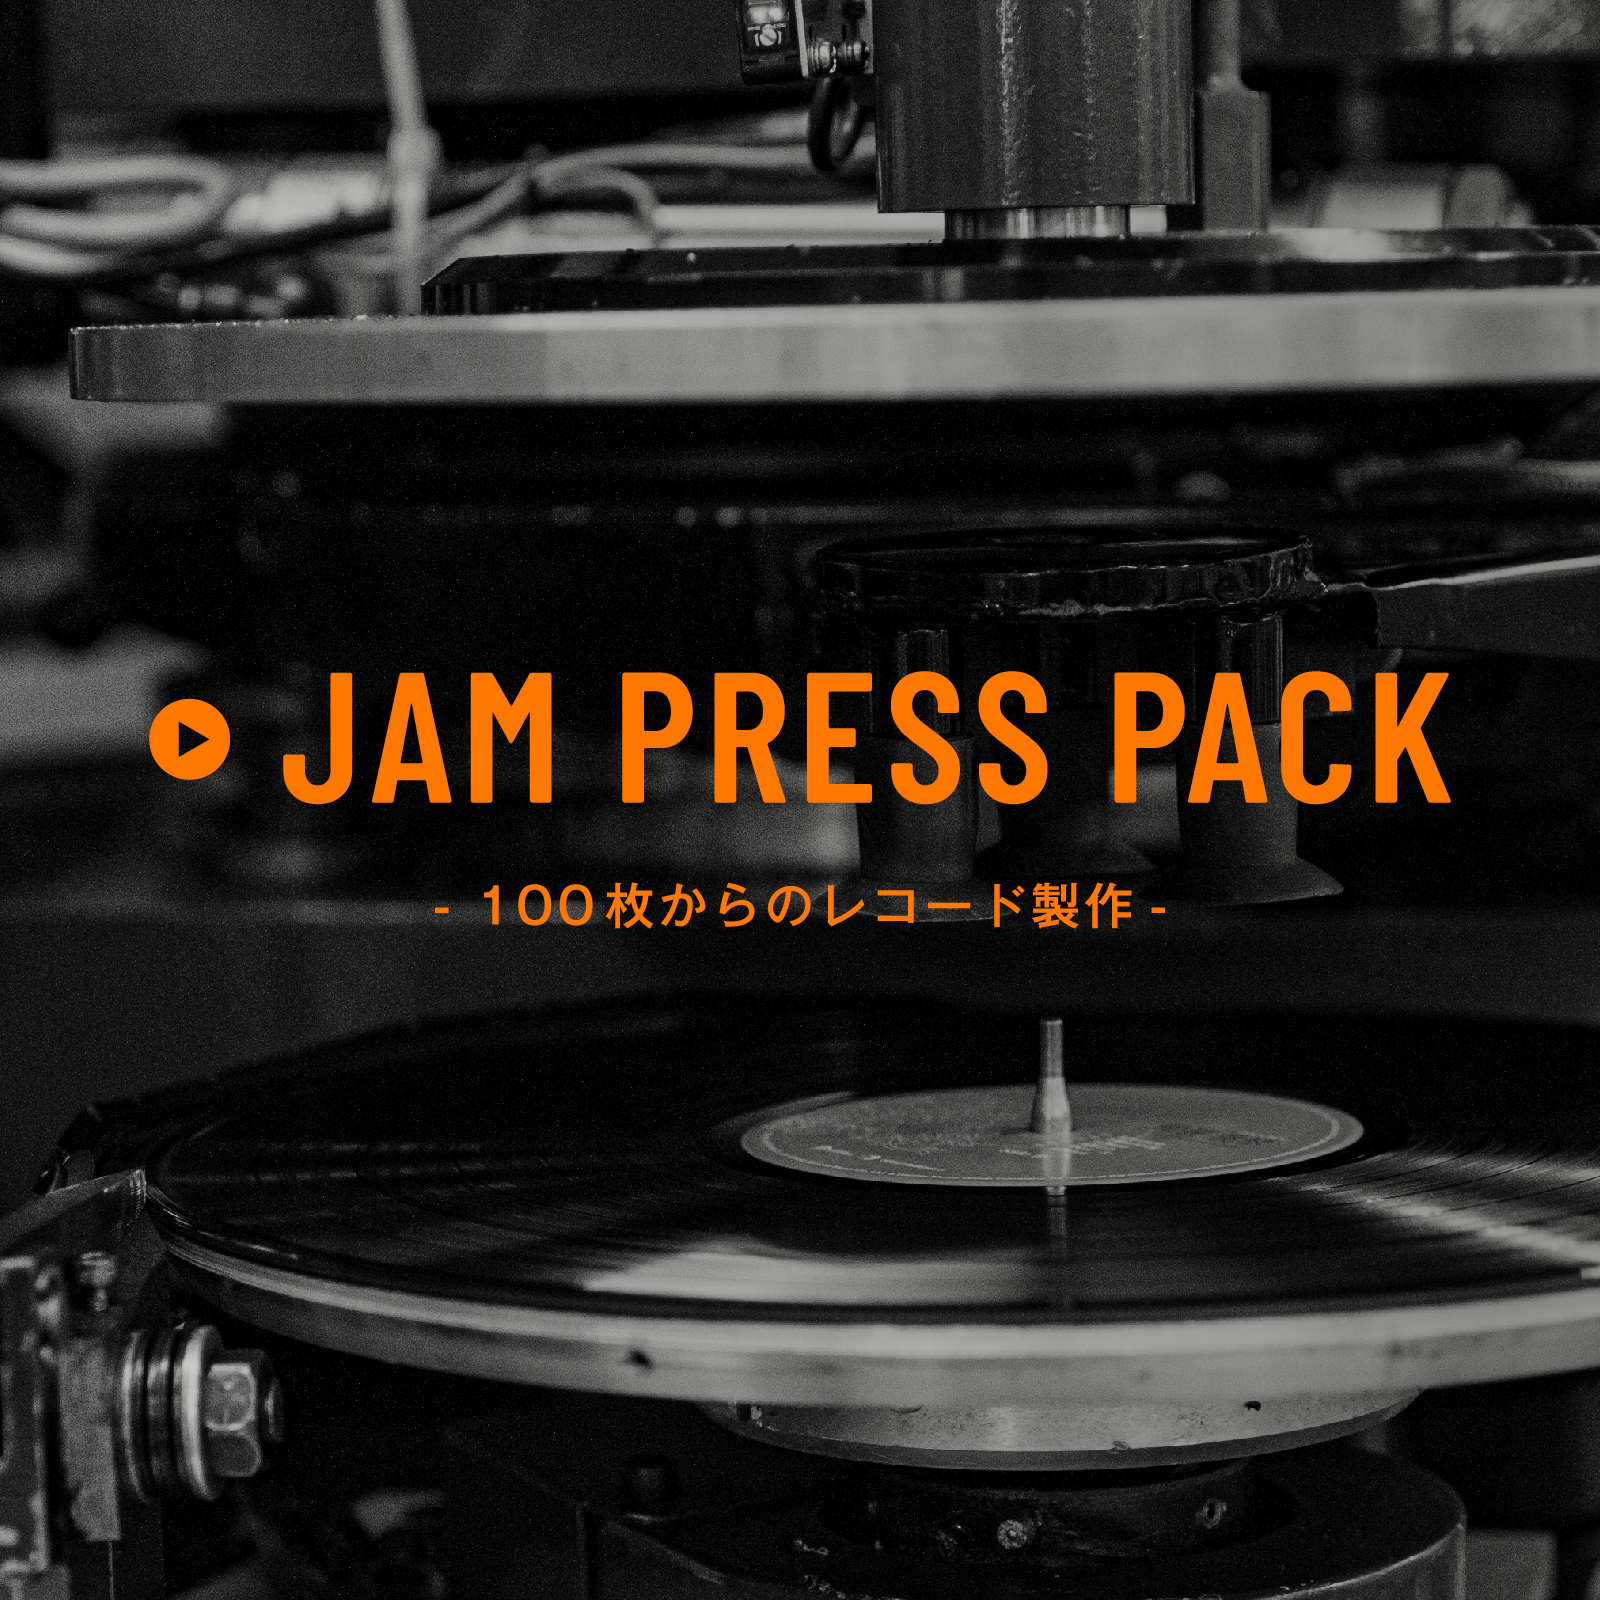 JAM PRESS PACK